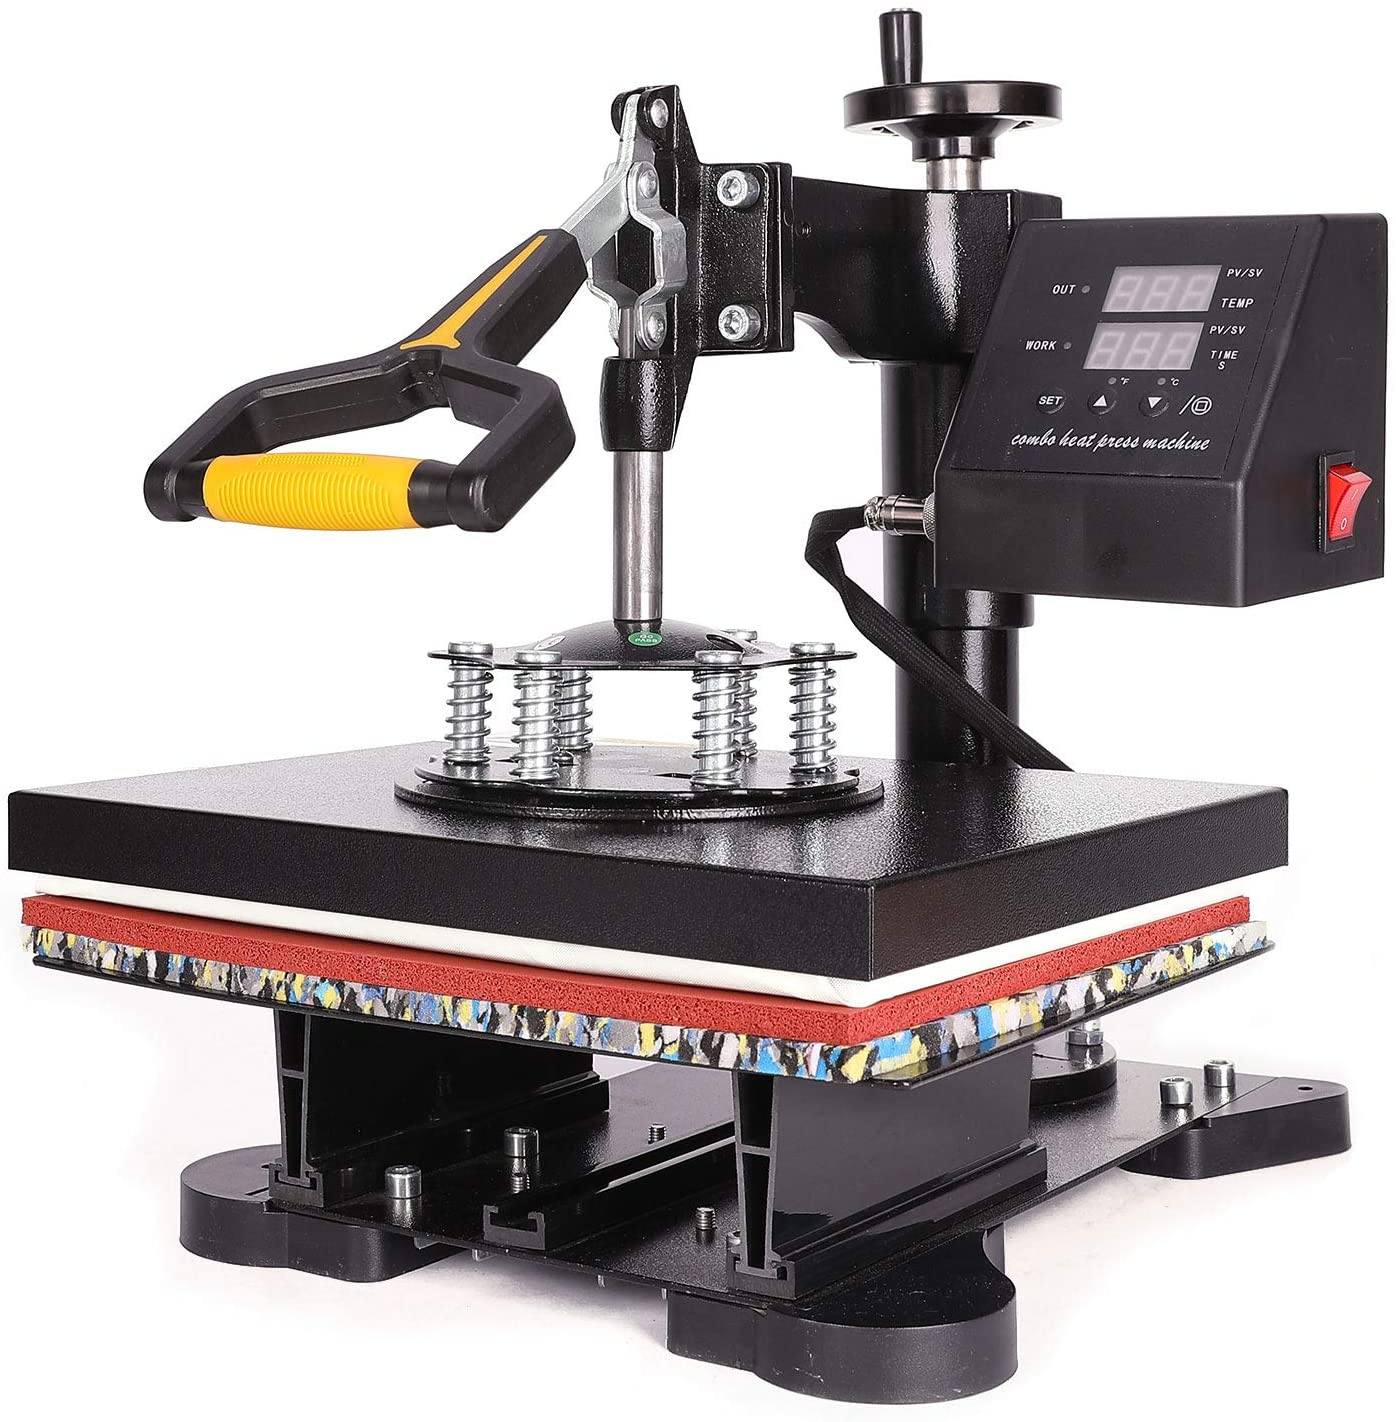 Sfeomi Heat Press 30 x 38cm printer reviews uk